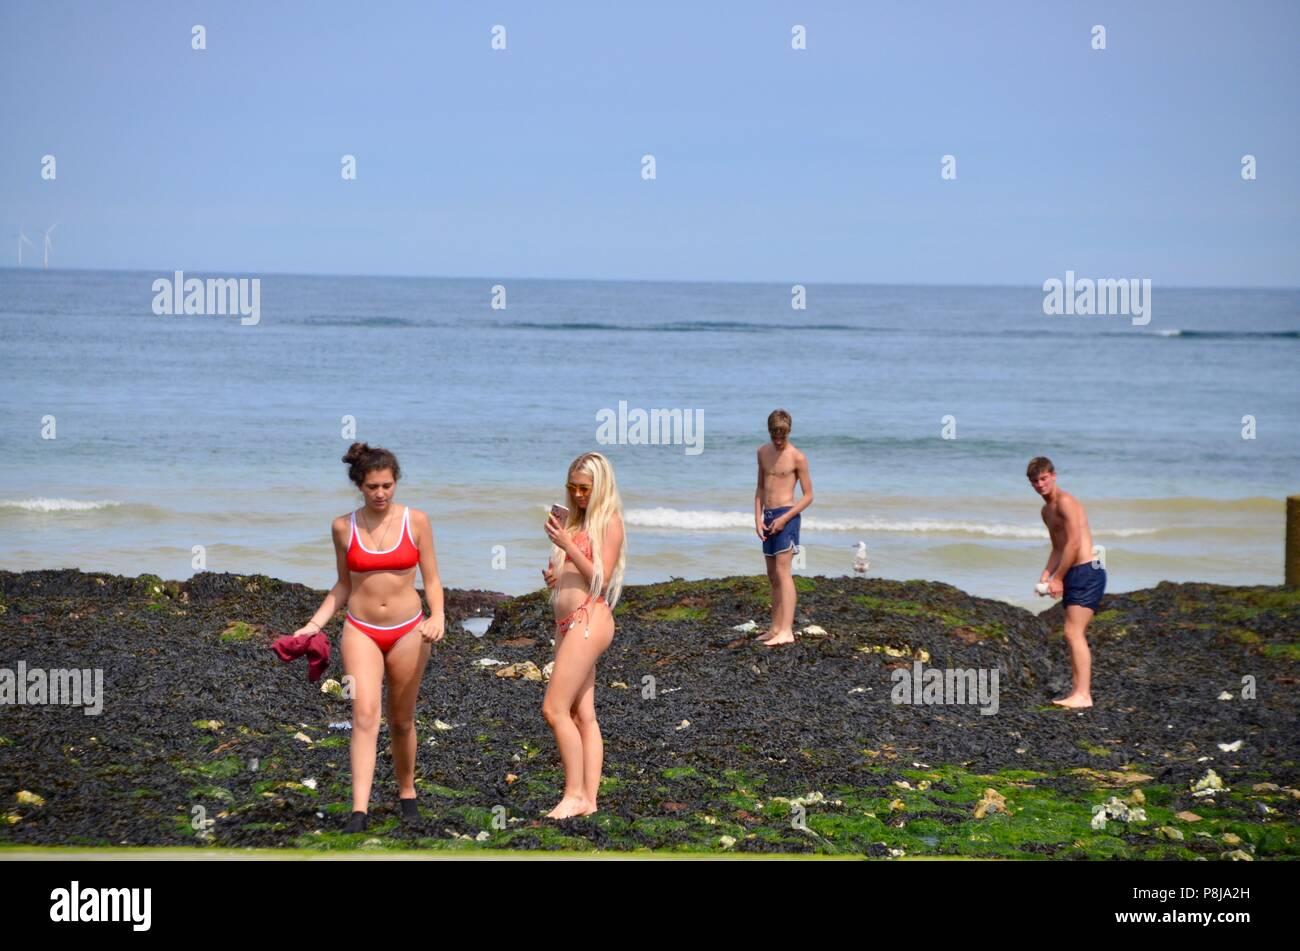 women in bikinis taking selfies on beach broadstairs kent UK - Stock Image